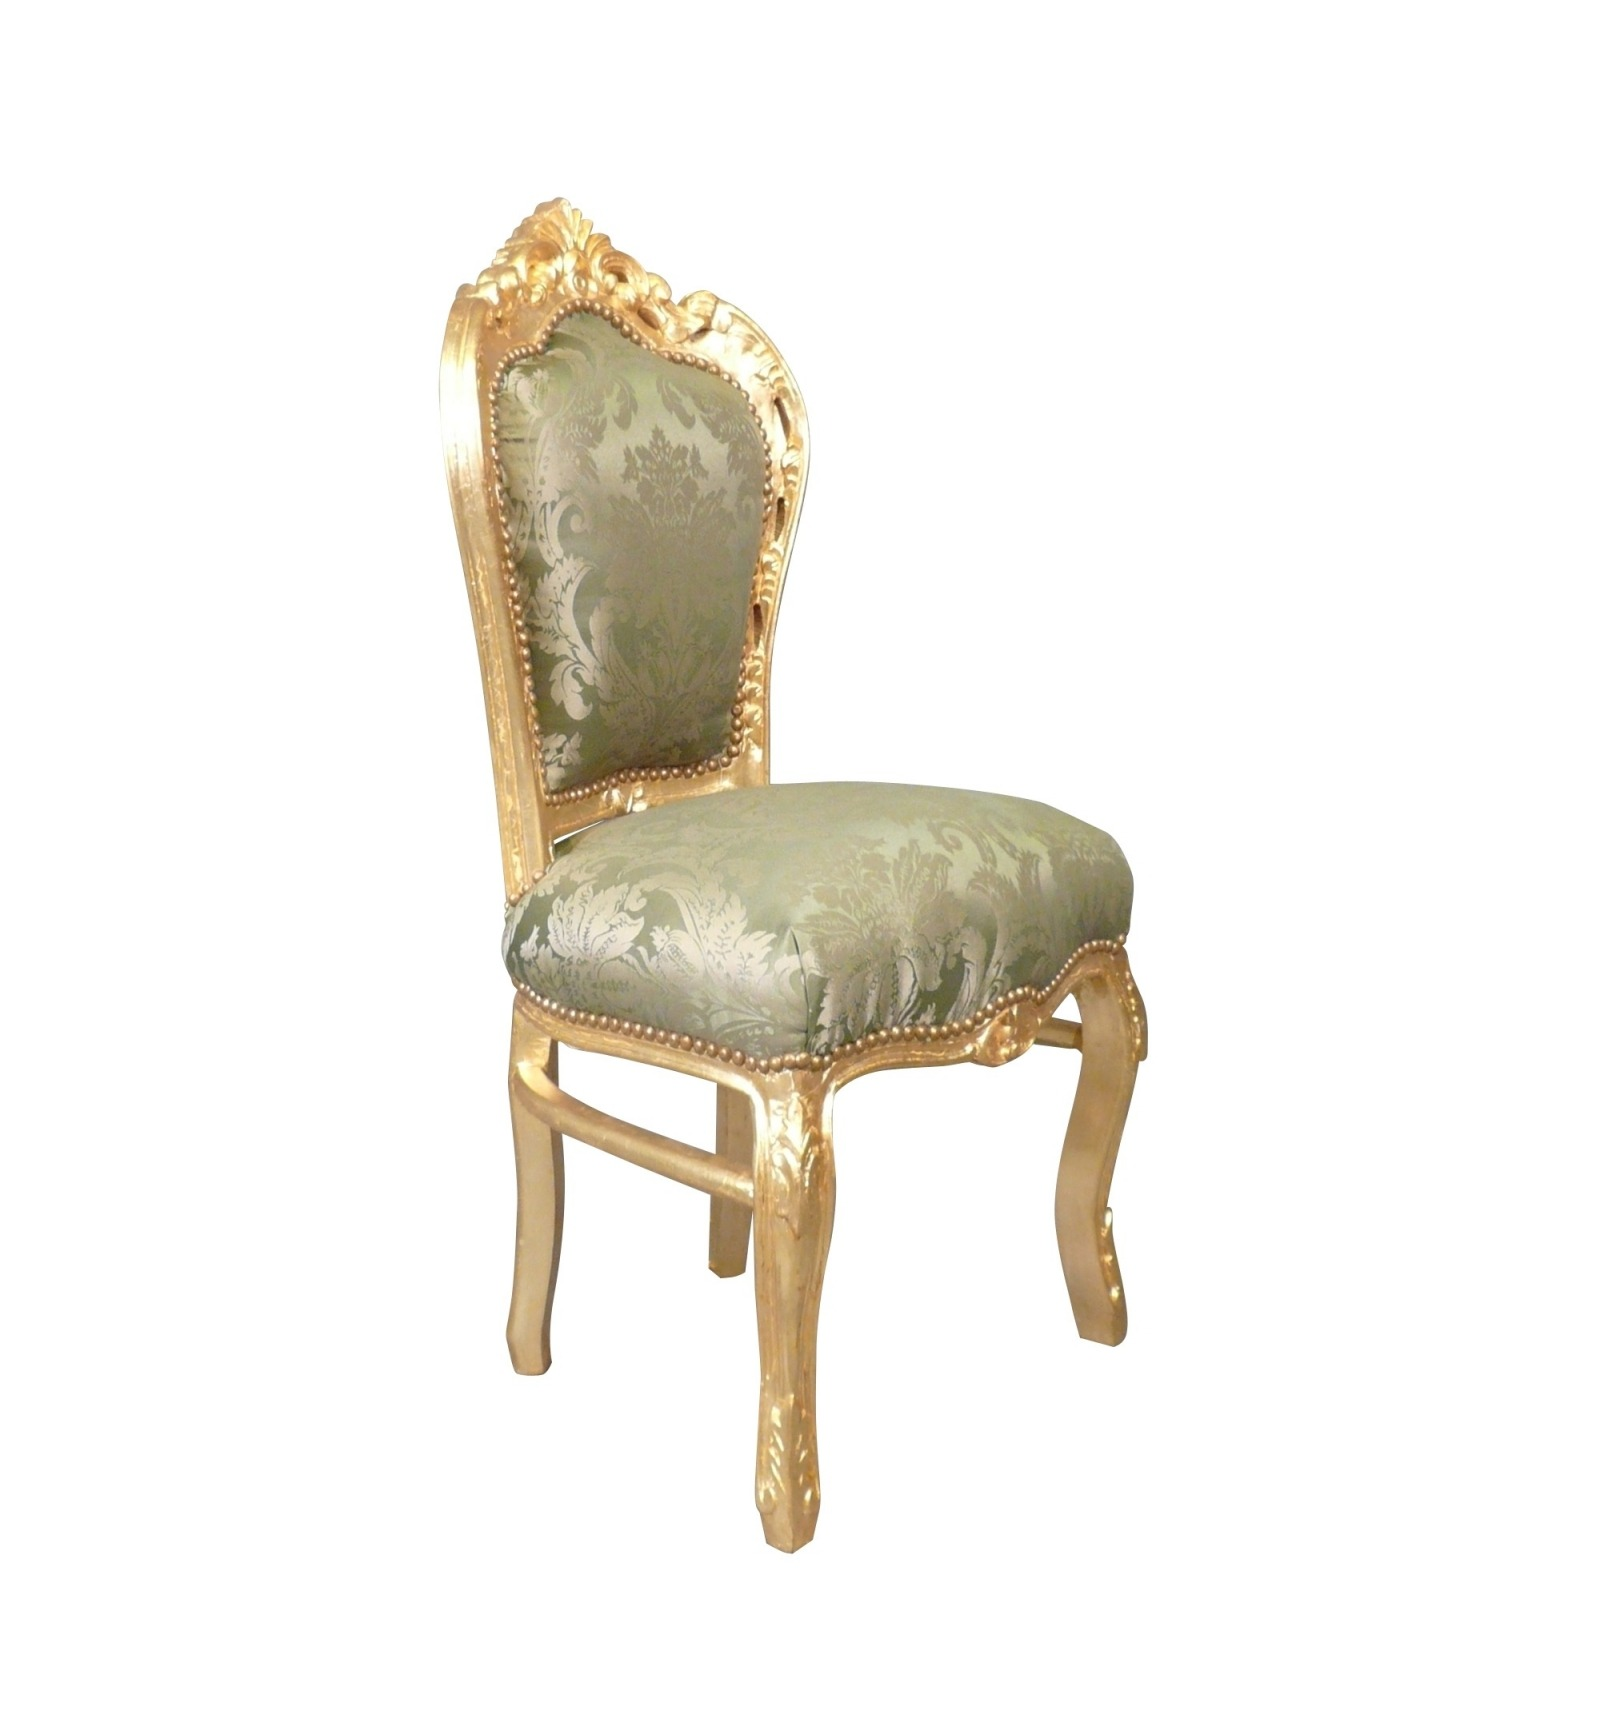 chaise baroque verte chaise baroque verte en bois dor - Chaise Baroque